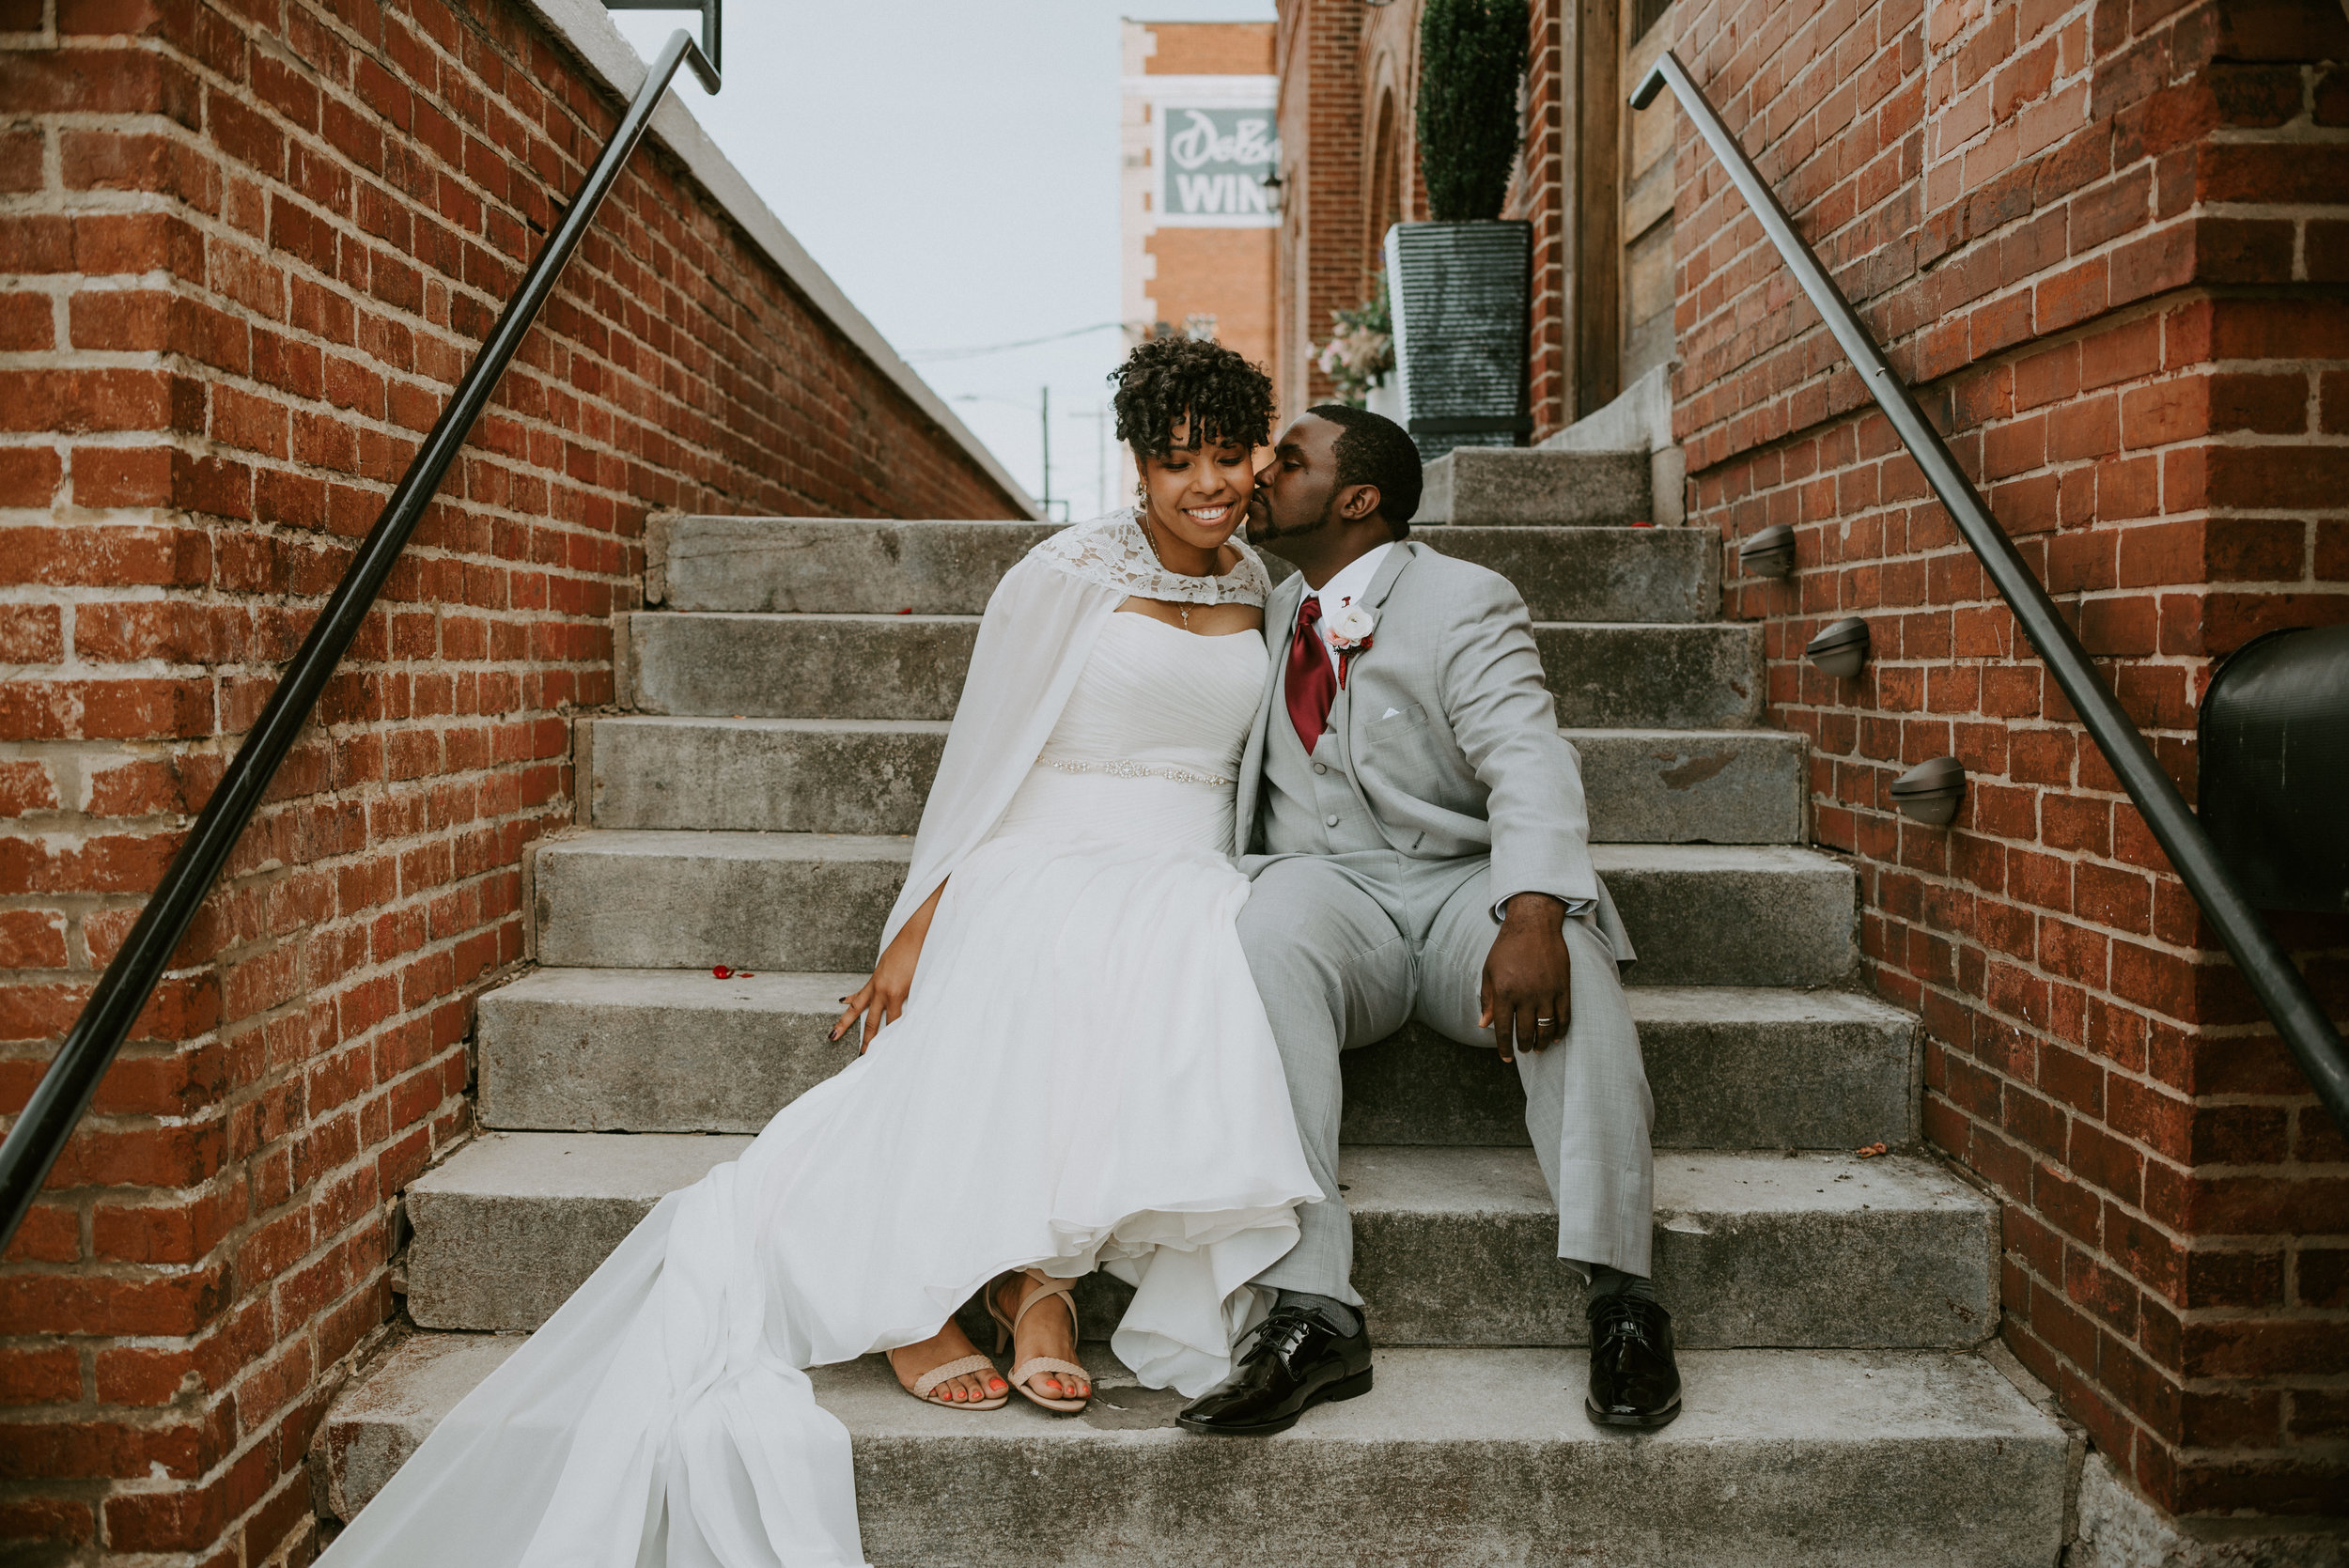 WonderlyCreative_Wedding_6.7.18_Khara&Dwayne_-706.jpg